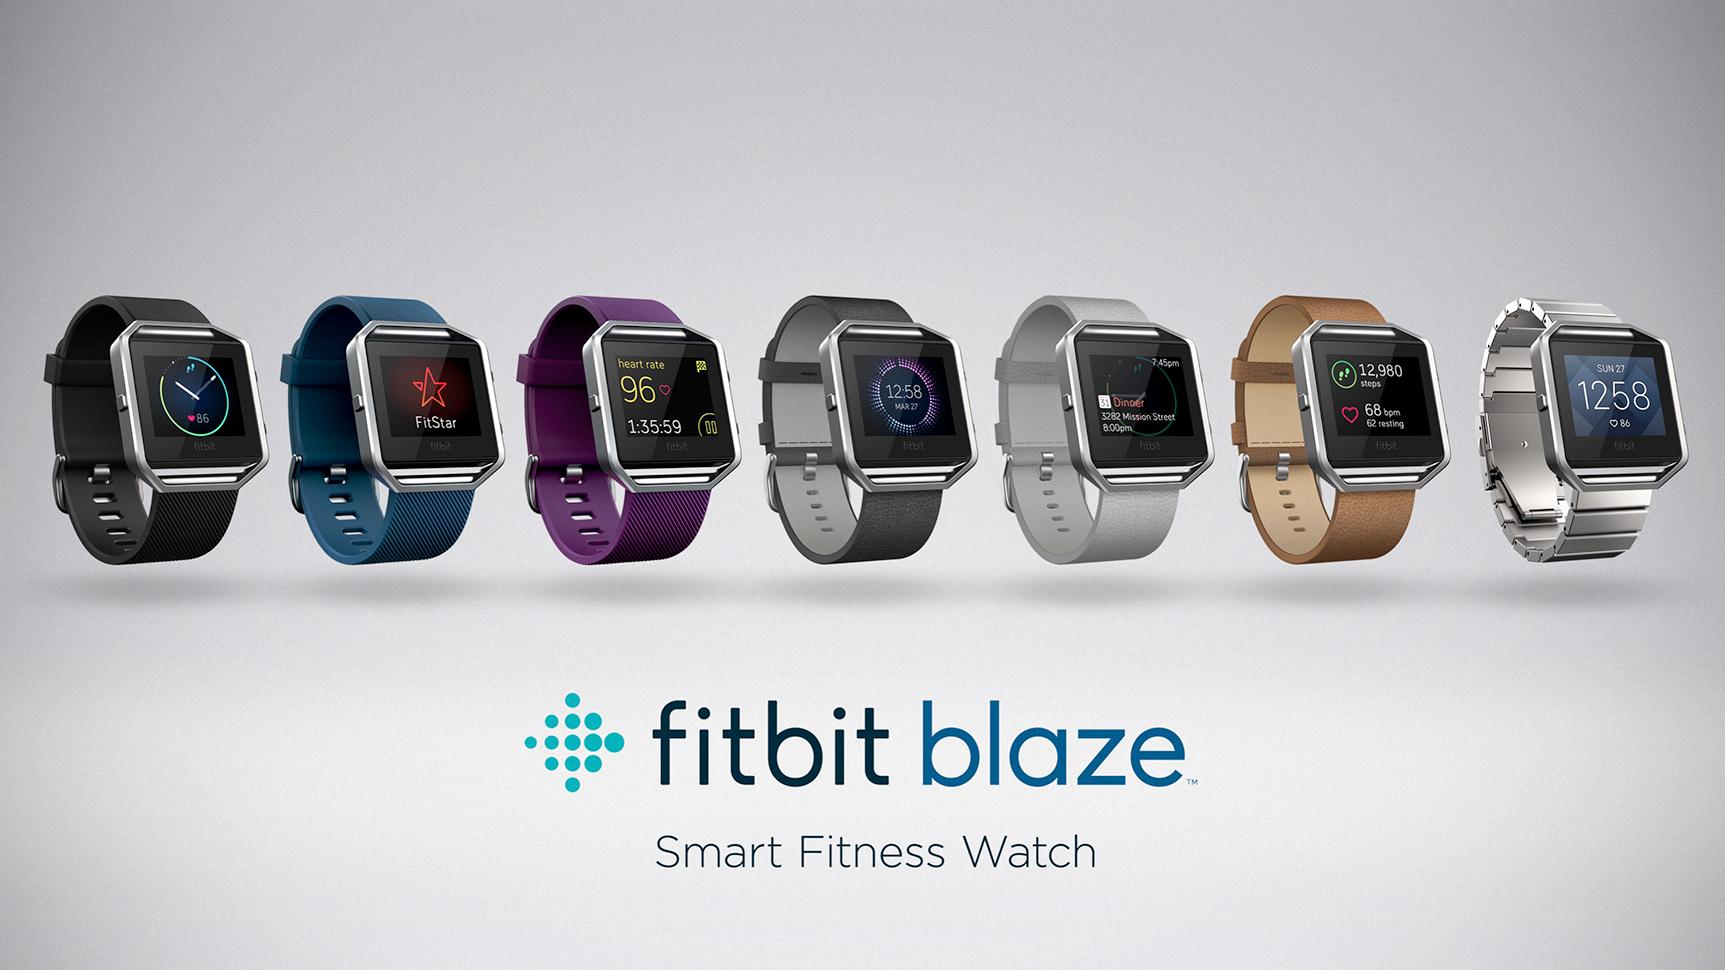 FitBit Blaze lineup image 001